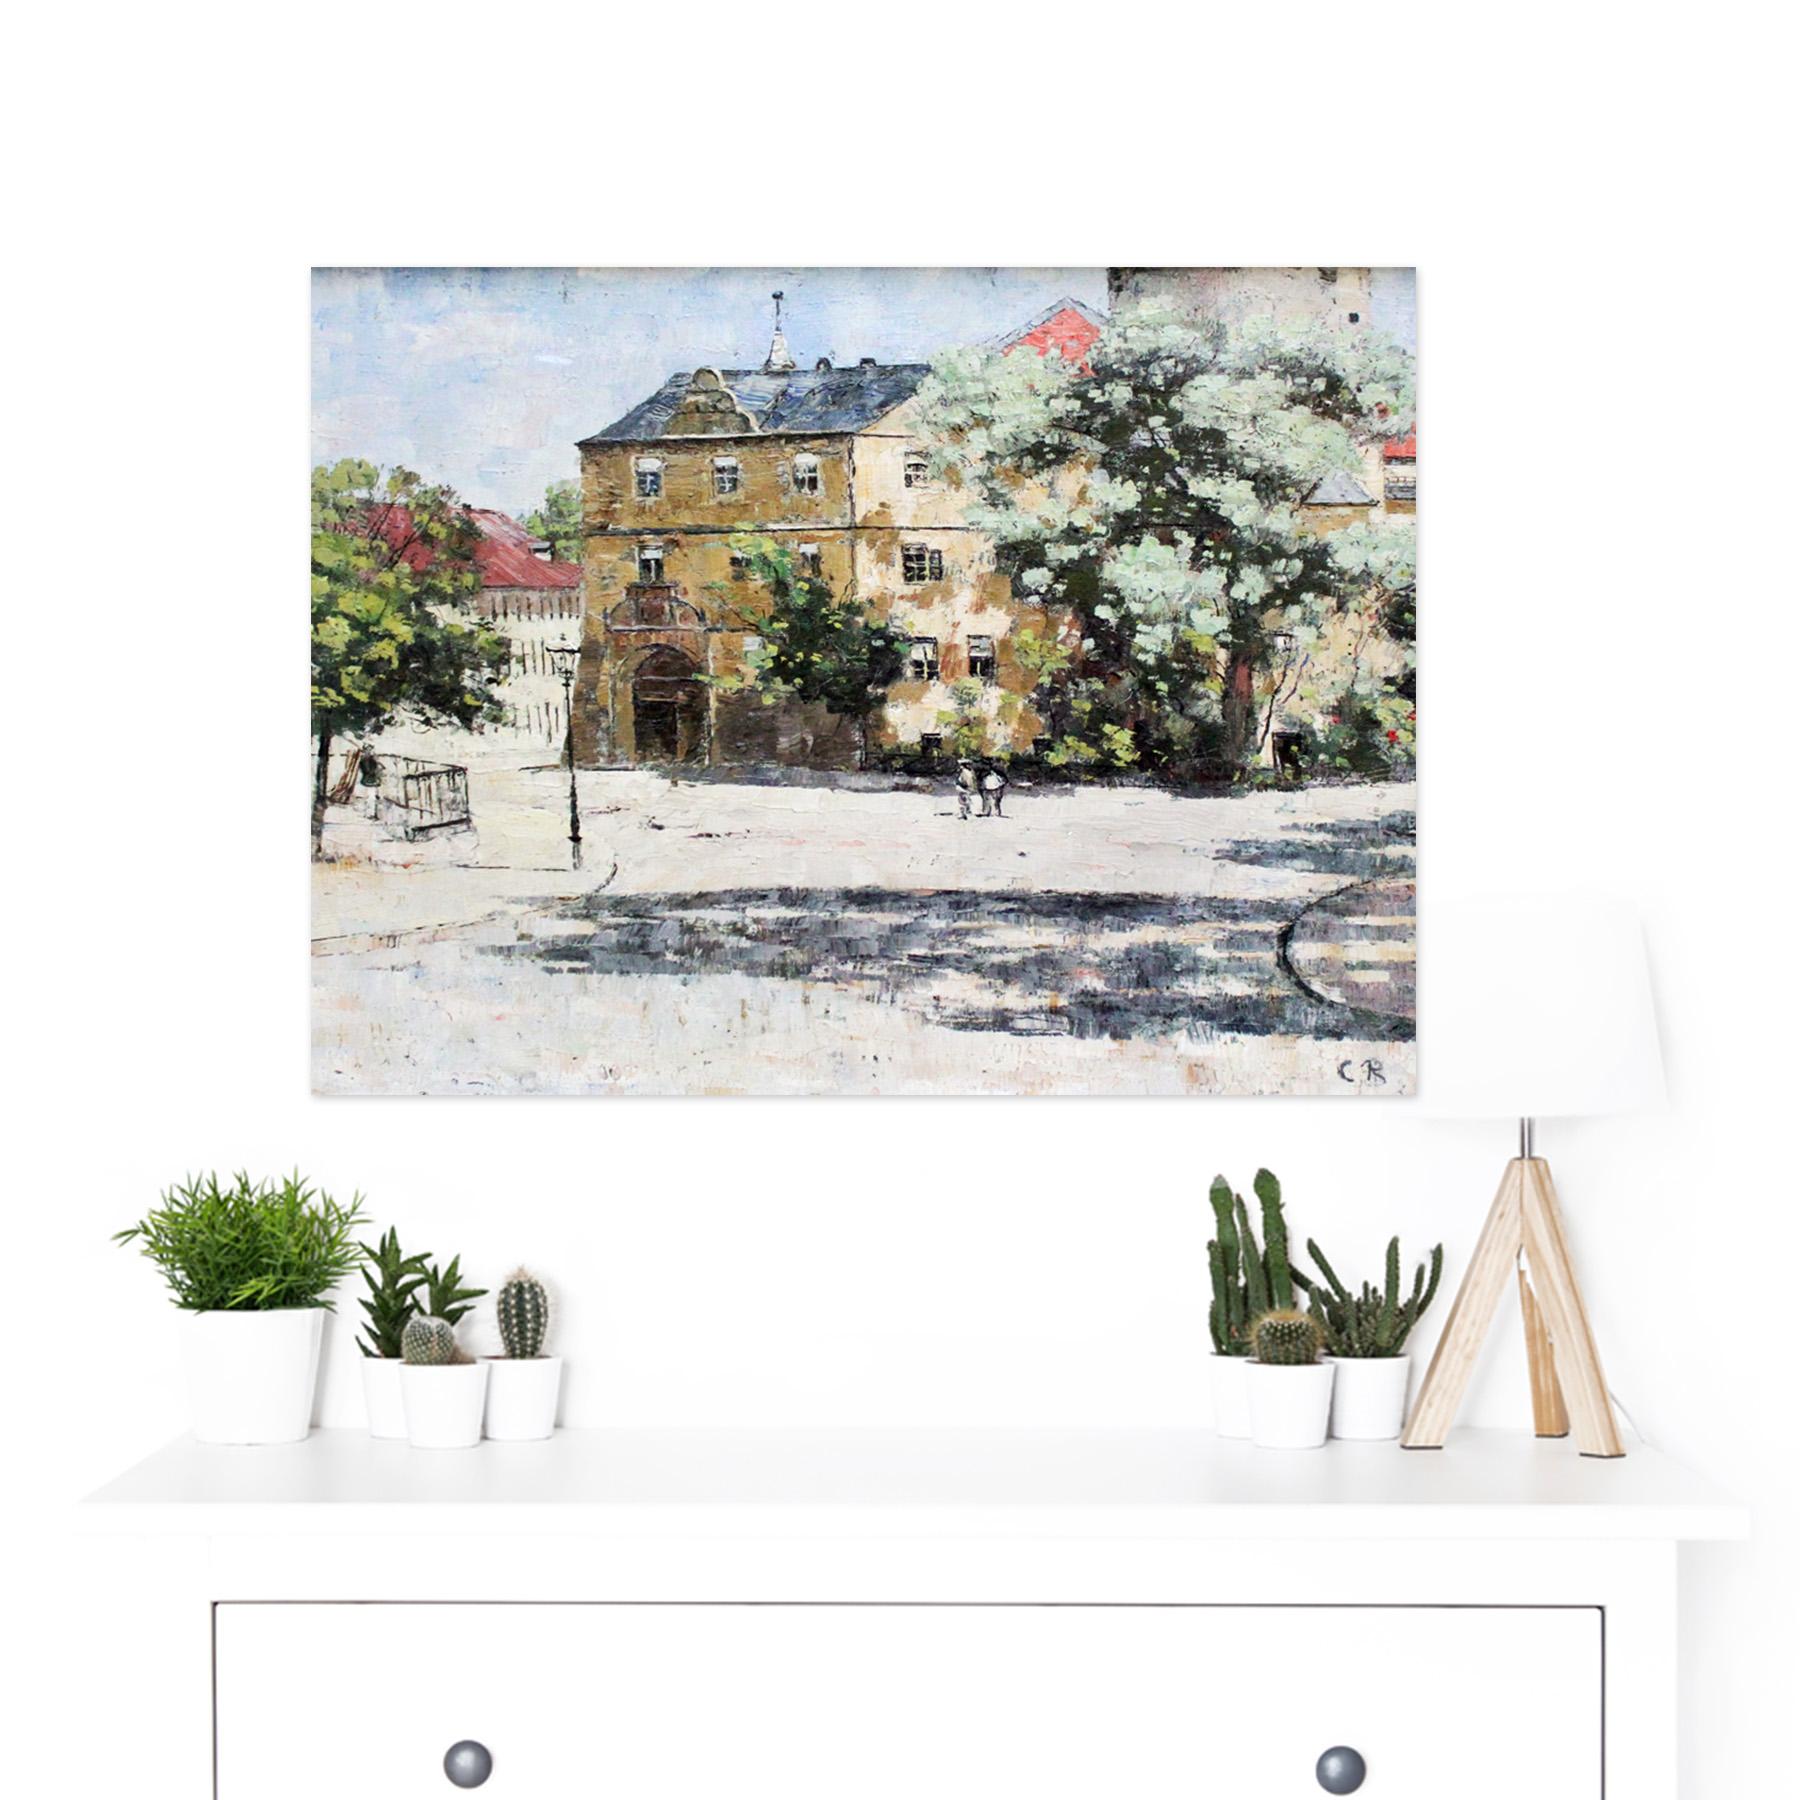 Rohlfs-Burgplatz-Weimar-Painting-Large-Framed-Art-Print thumbnail 3